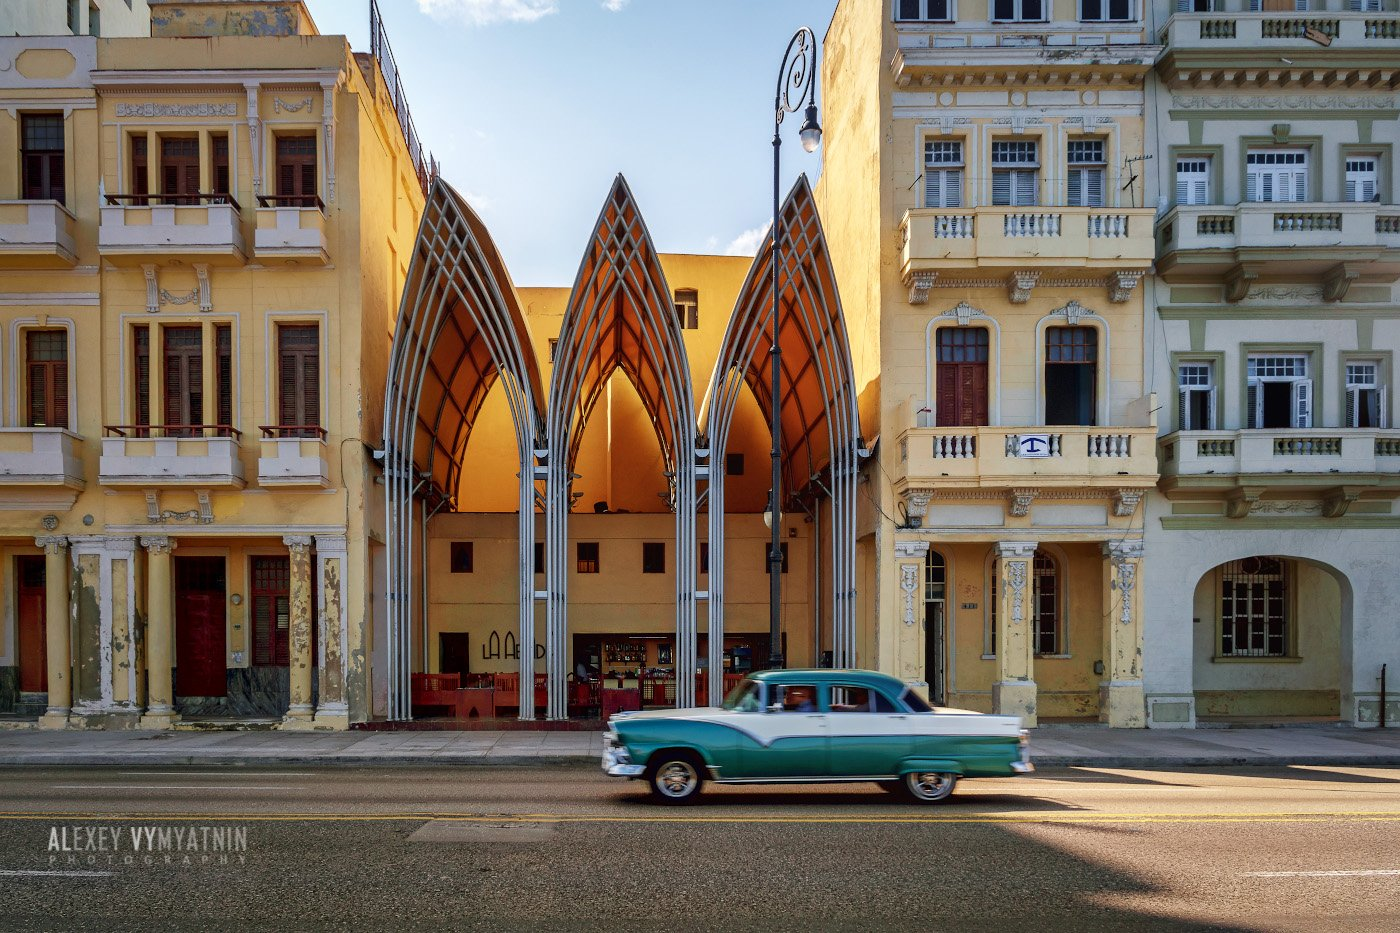 cuba, libre, havana, car, old car, гавана, куба, street, urban, sunny, colors, Алексей Вымятнин